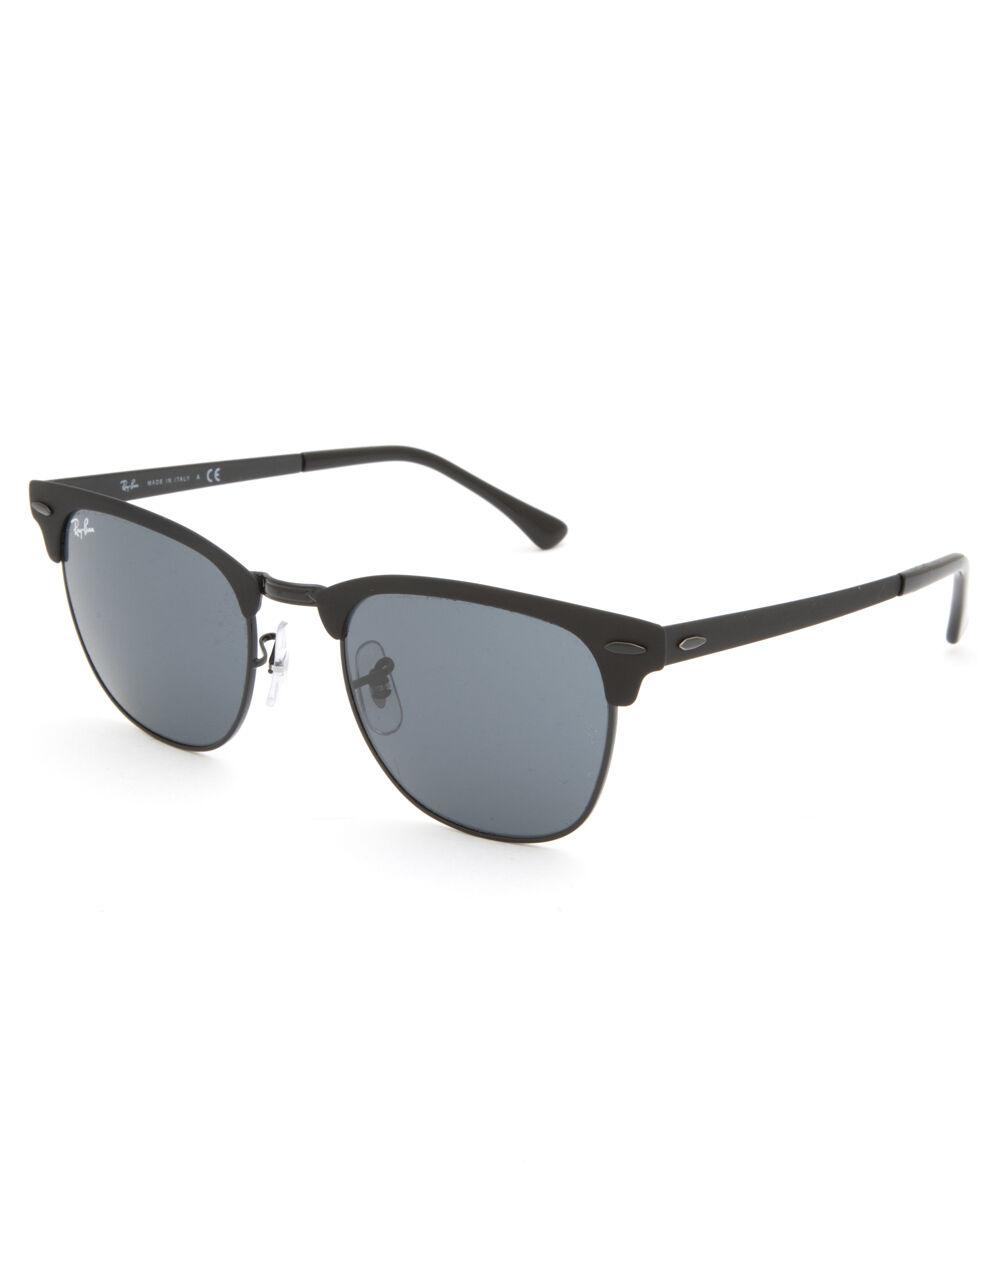 RAY-BAN Clubmaster Metal Black & Black Gradient Sunglasses